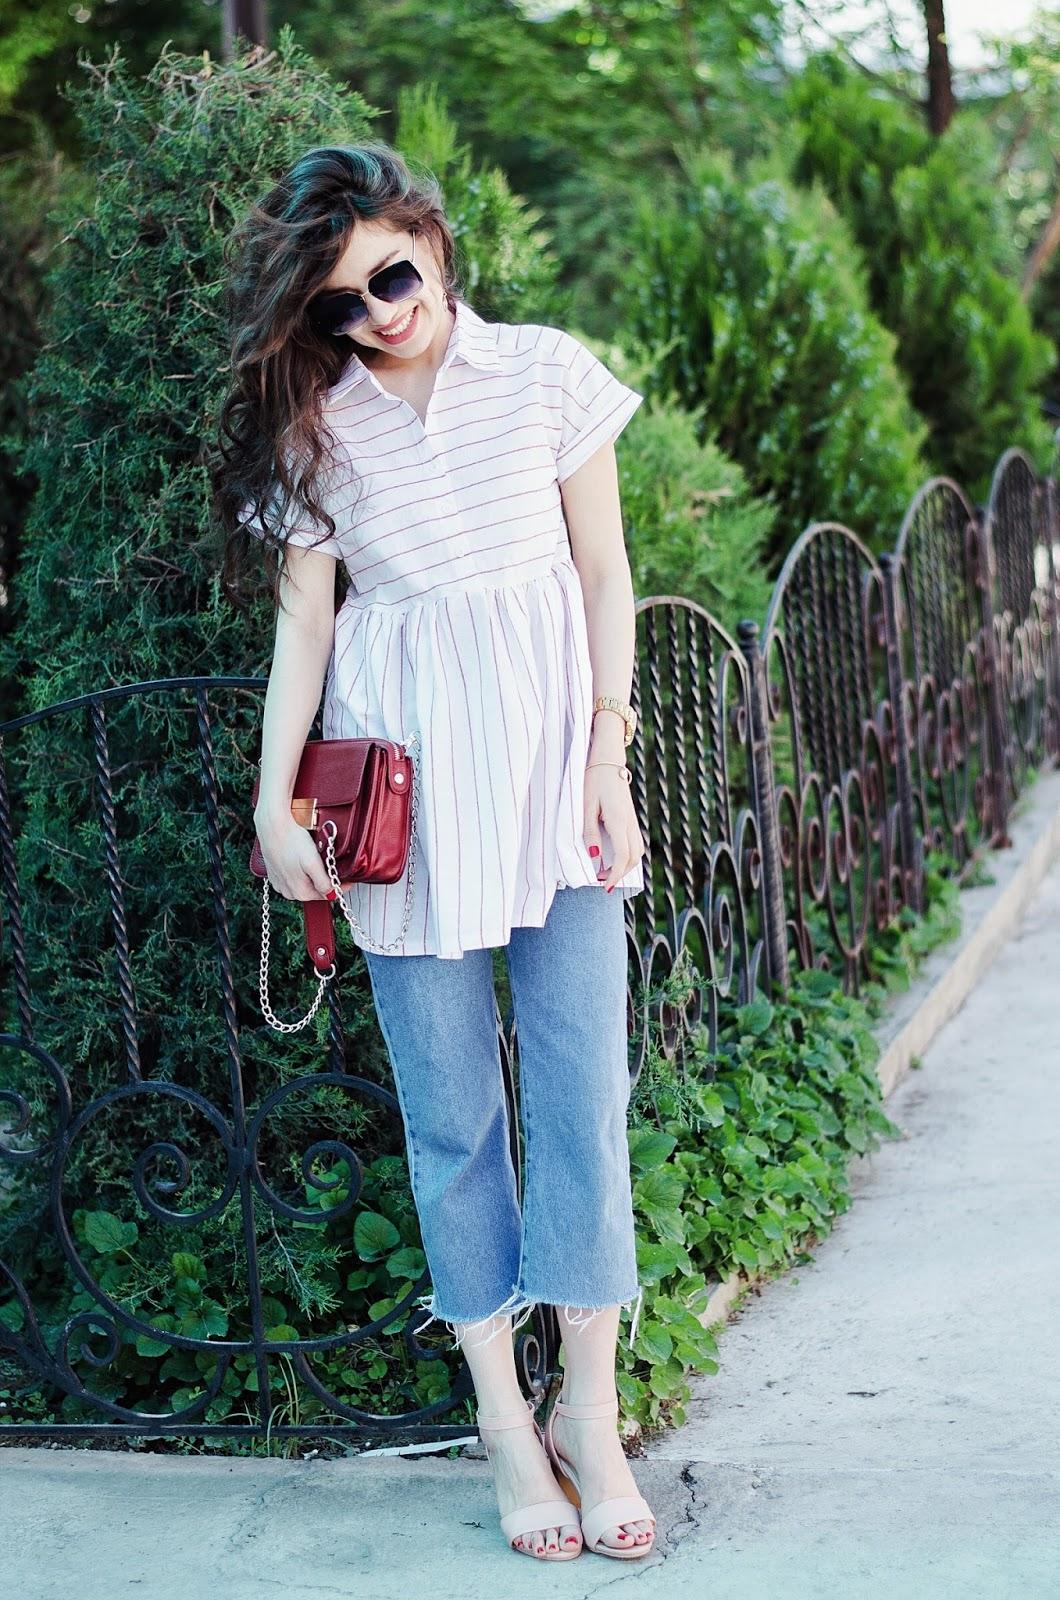 fashion blogger diyorasnotes diyora beta dress and jeans ripped jeans heels sandals pink striped top